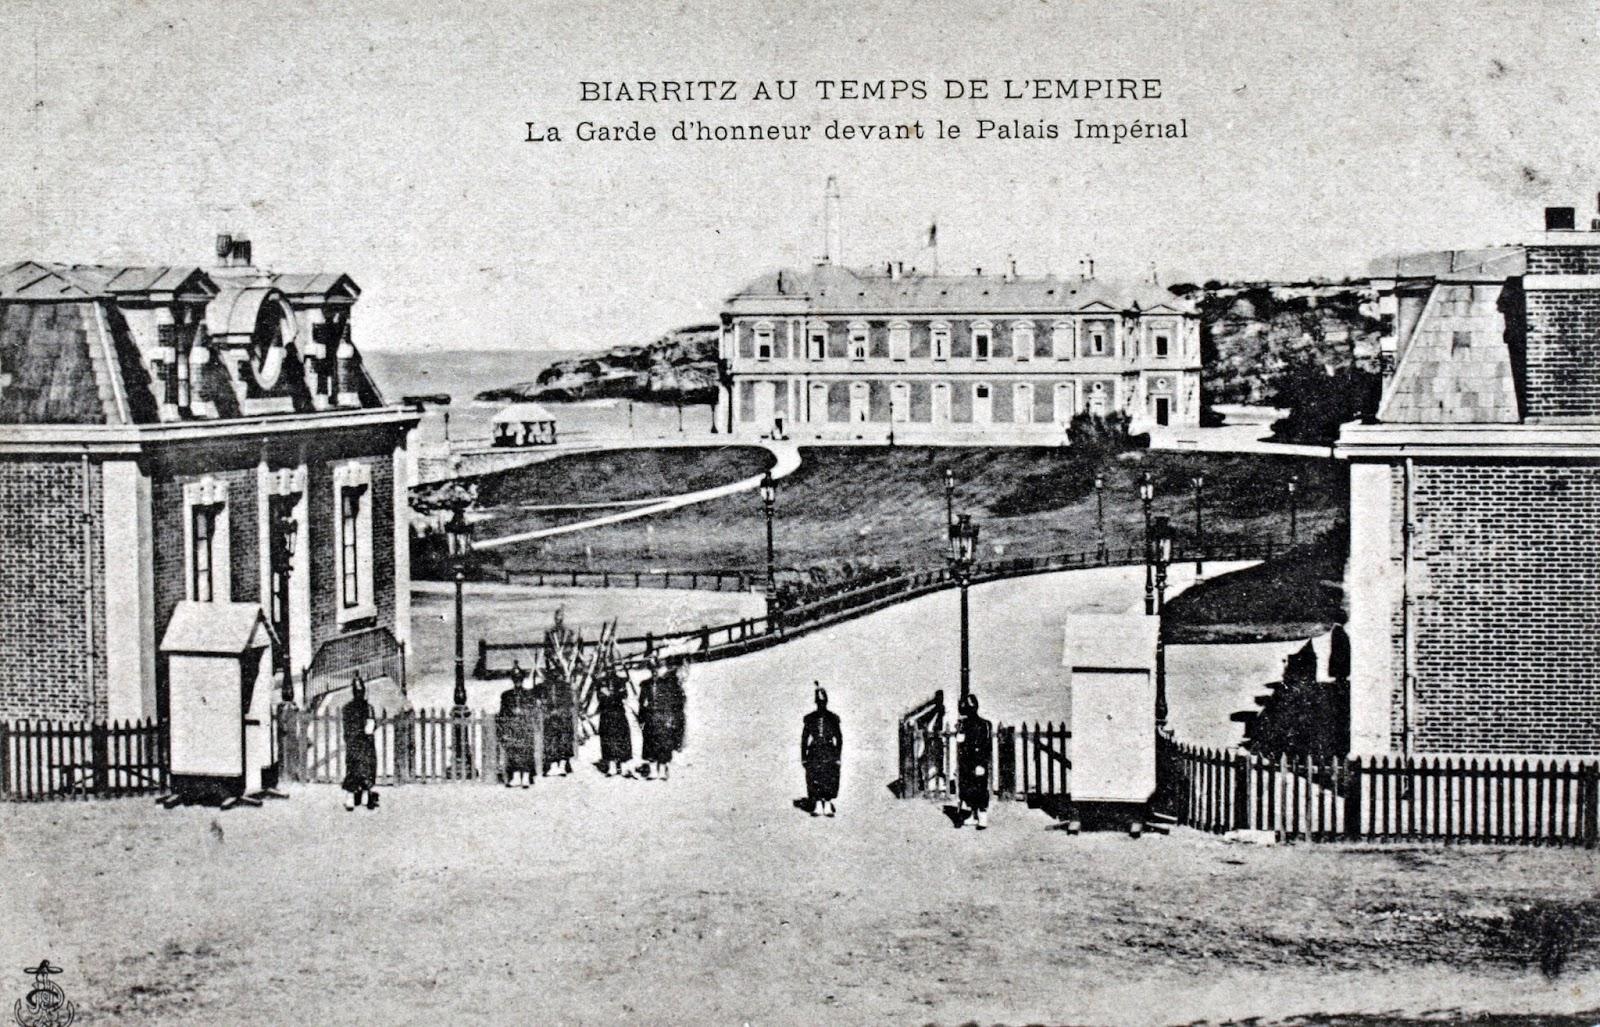 Domaine imperial de Biarritz